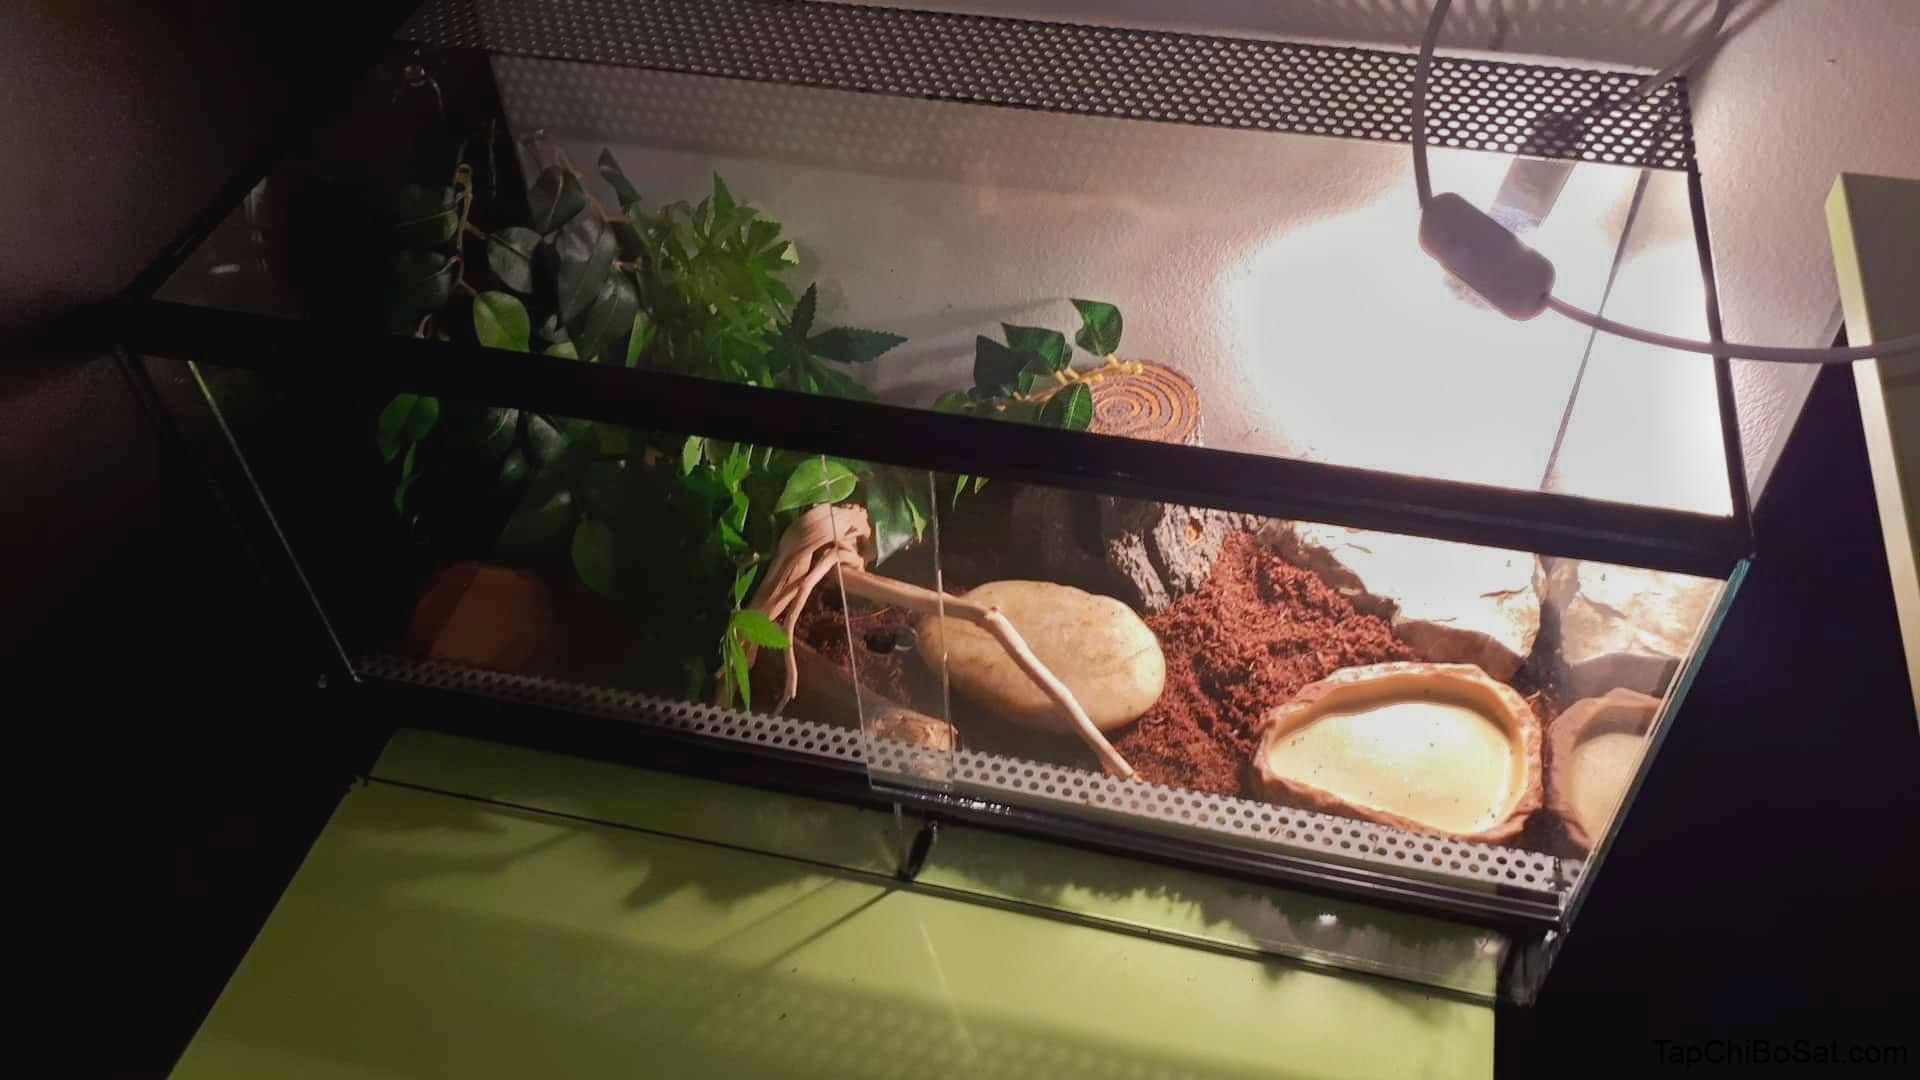 Rate my Pictus gecko setup : geckos